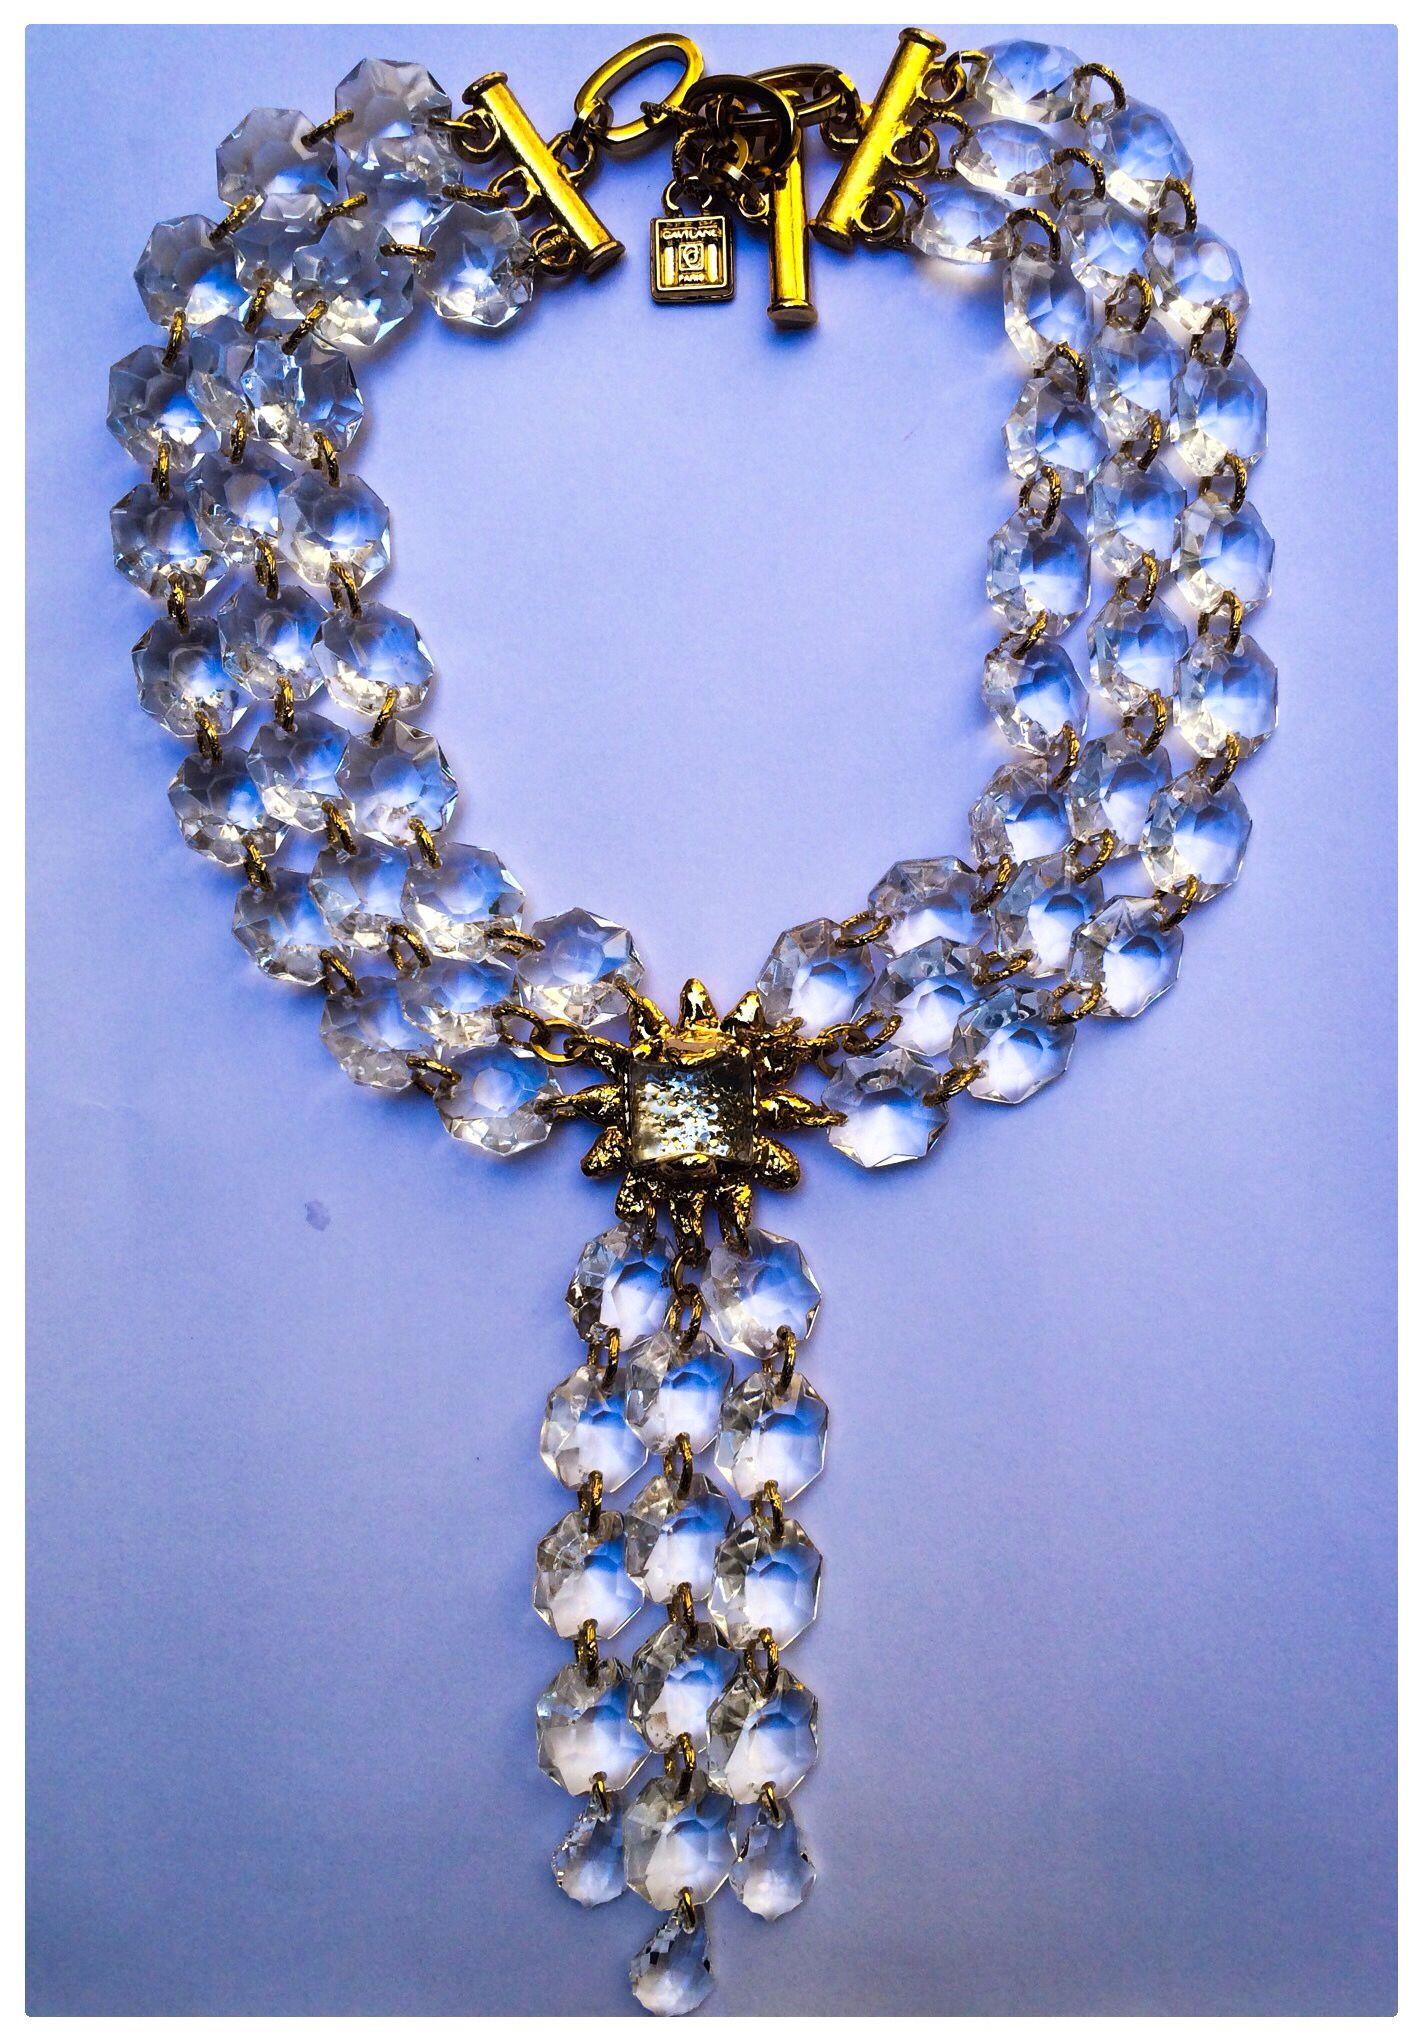 Collier Dark Cristal Gavilane Paris Bijoux Haute Couture